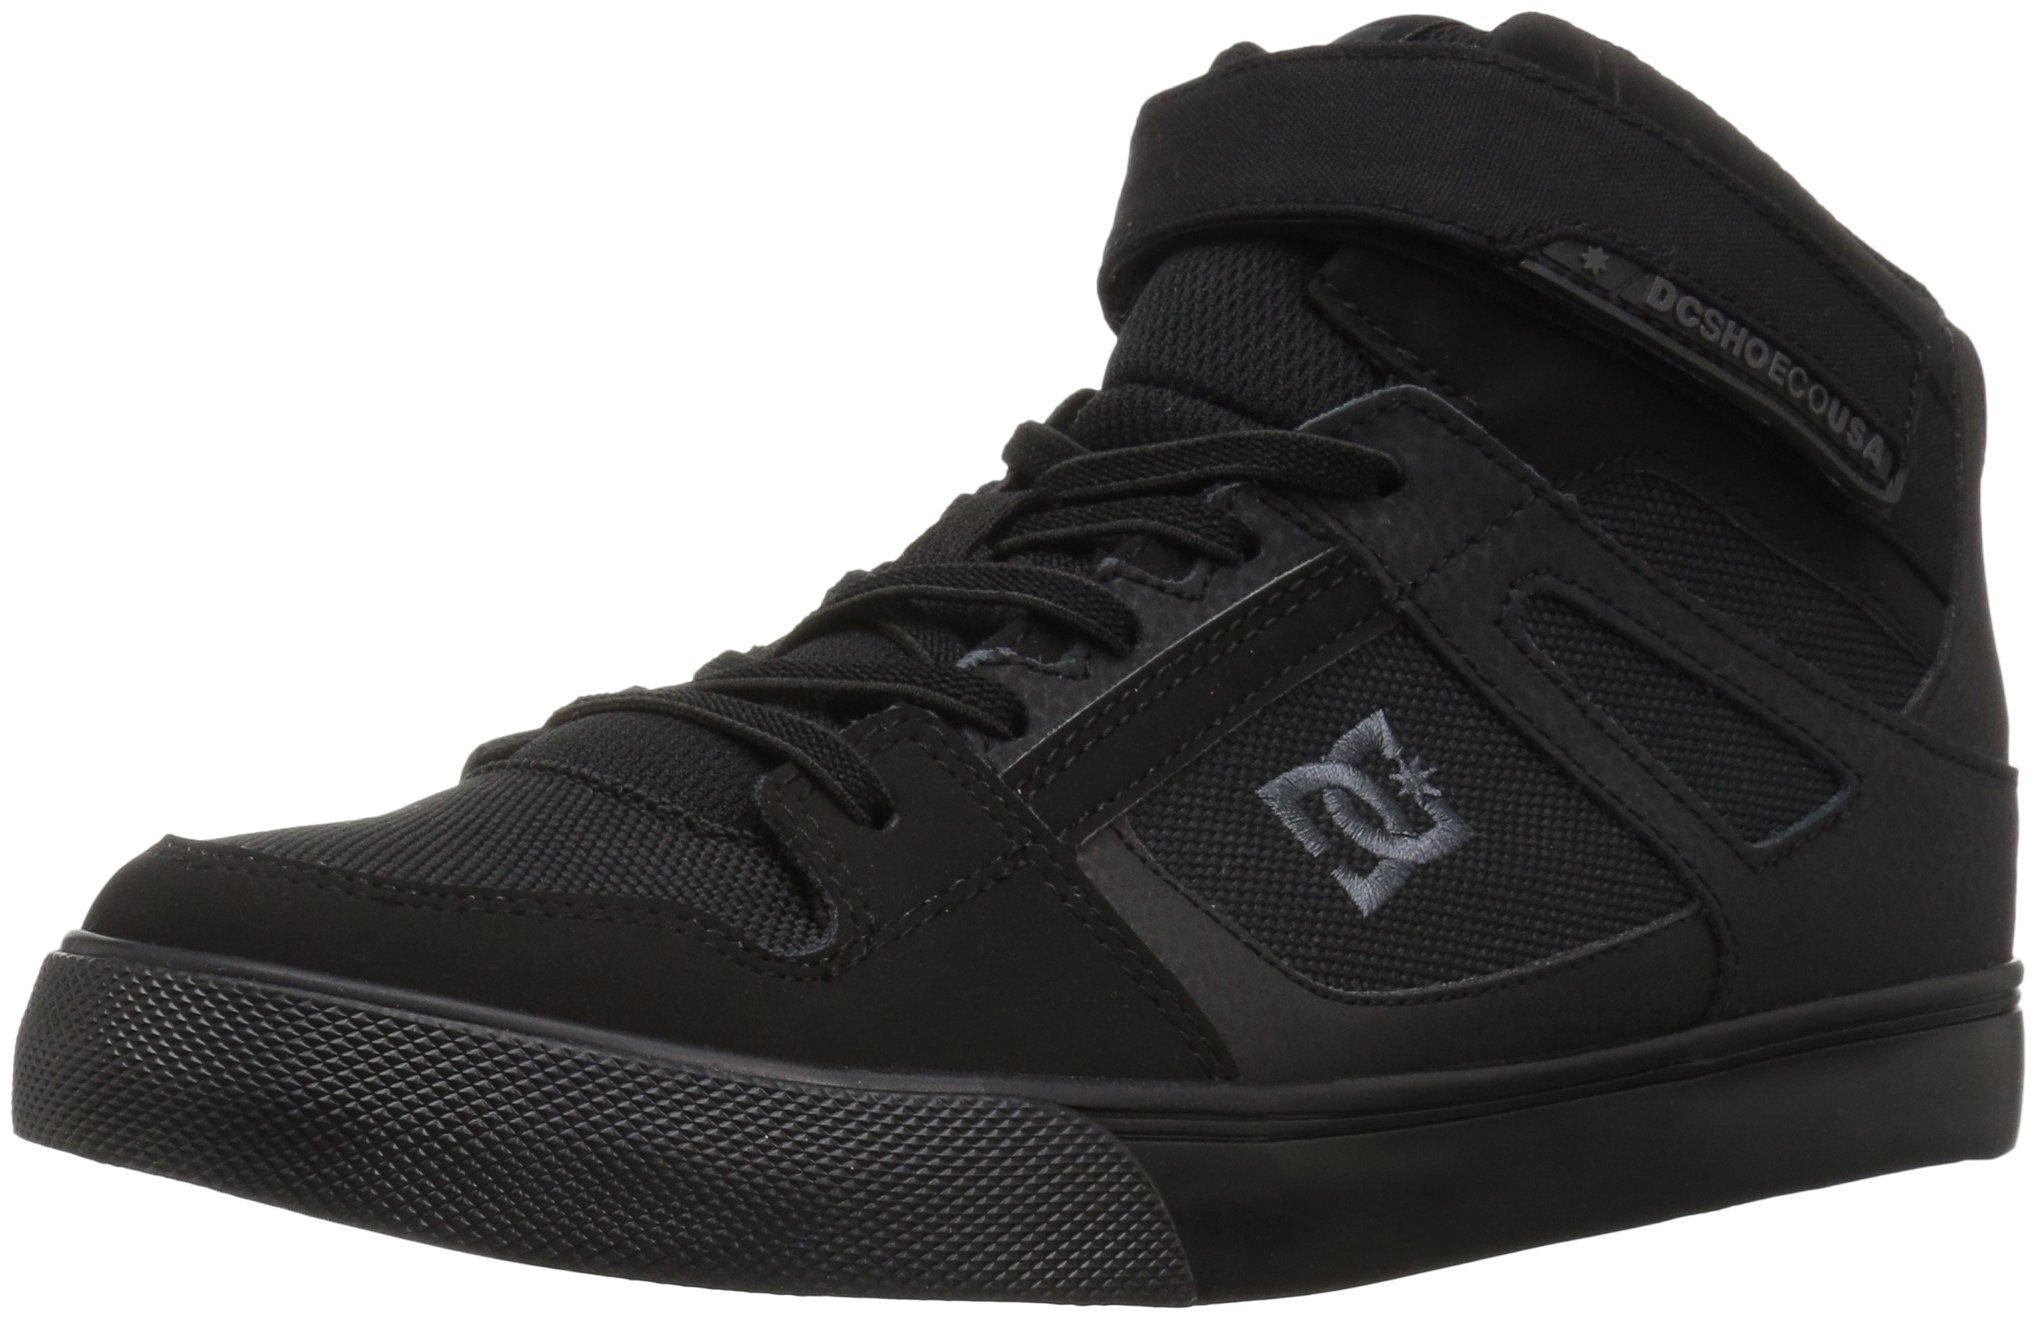 DC Boys' Pure HIGH-TOP EV Skate Shoe, Black, 12.5 M US Little Kid